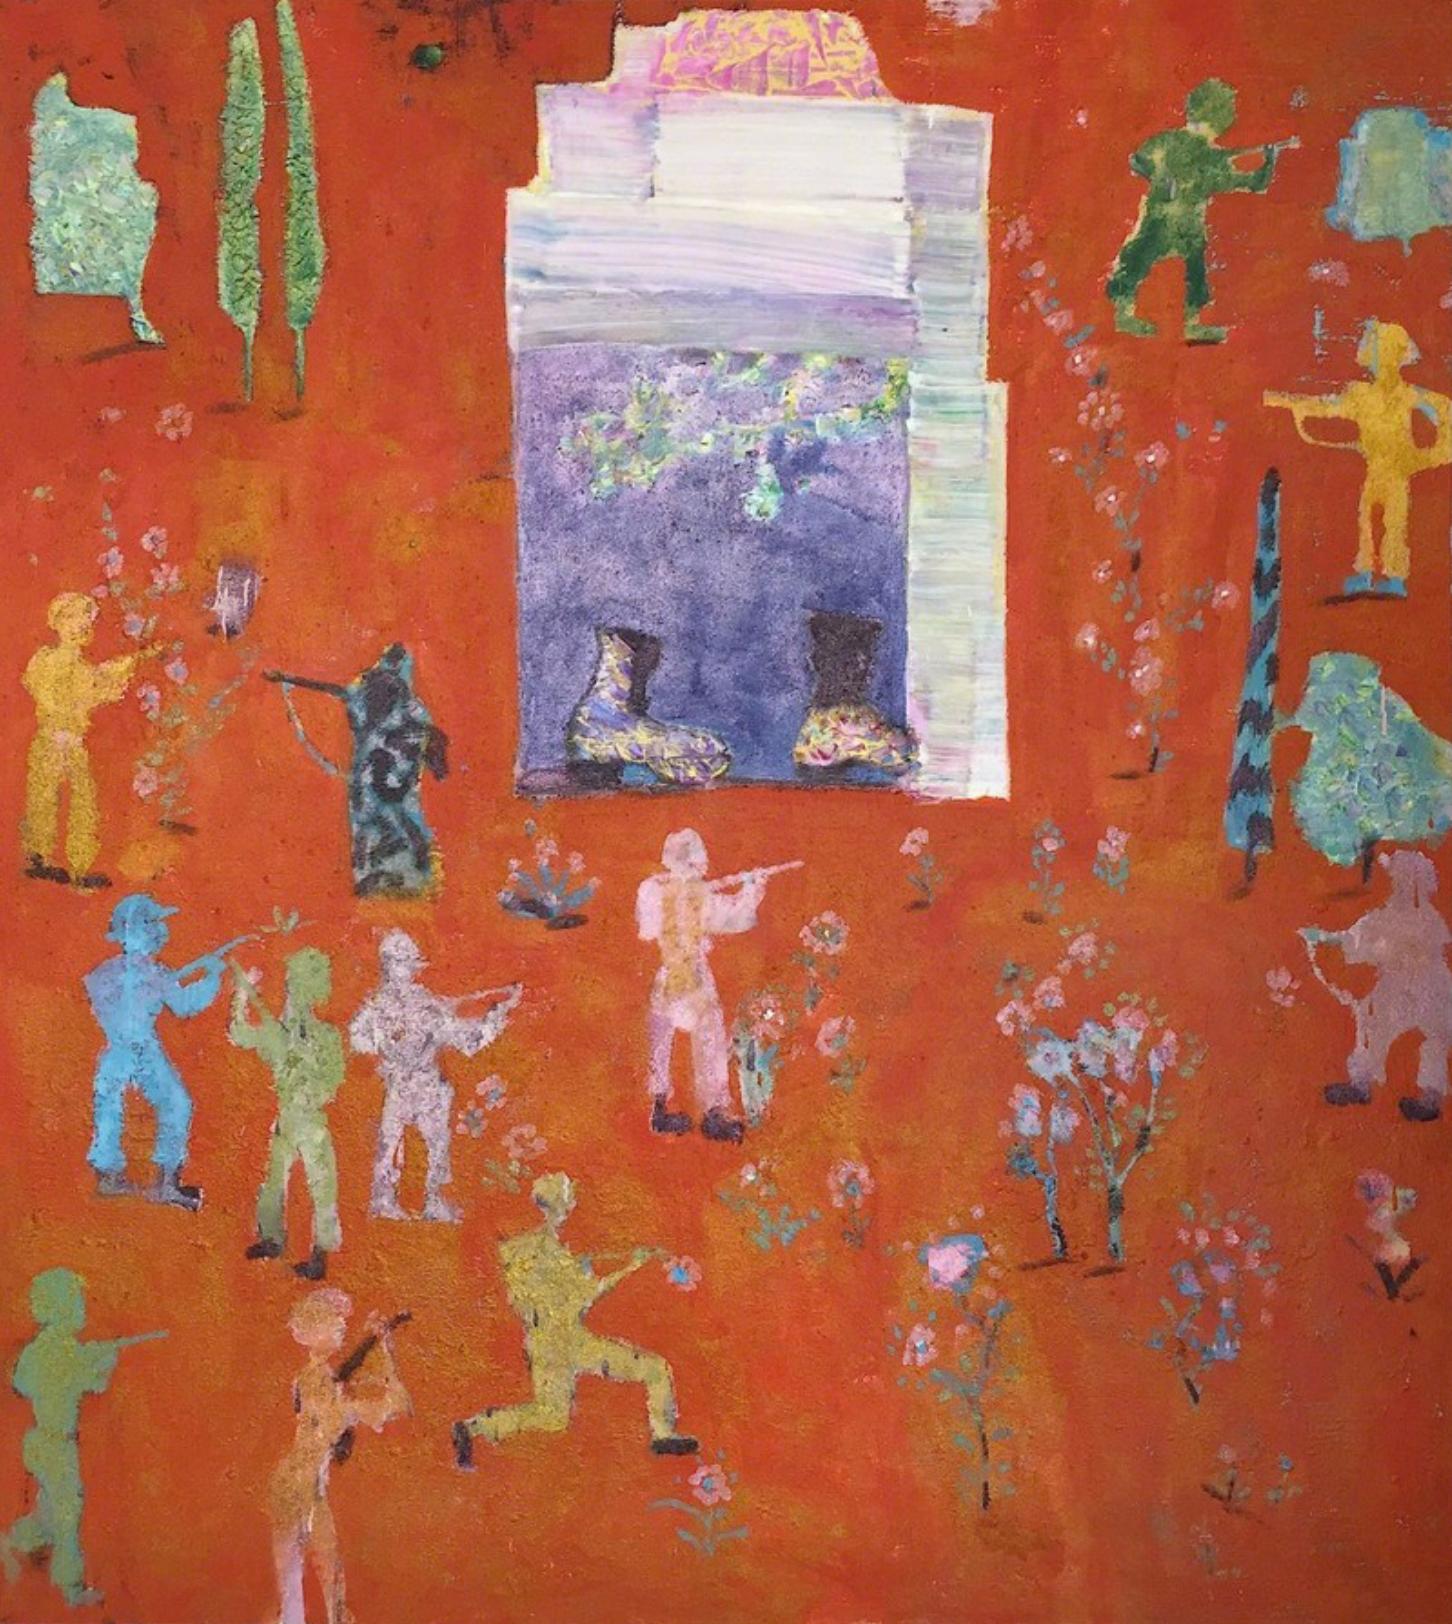 Reza Derakshani, Guns and Roses, oil, enamel and glitter on canvas, 190 x 170 cm, 2013